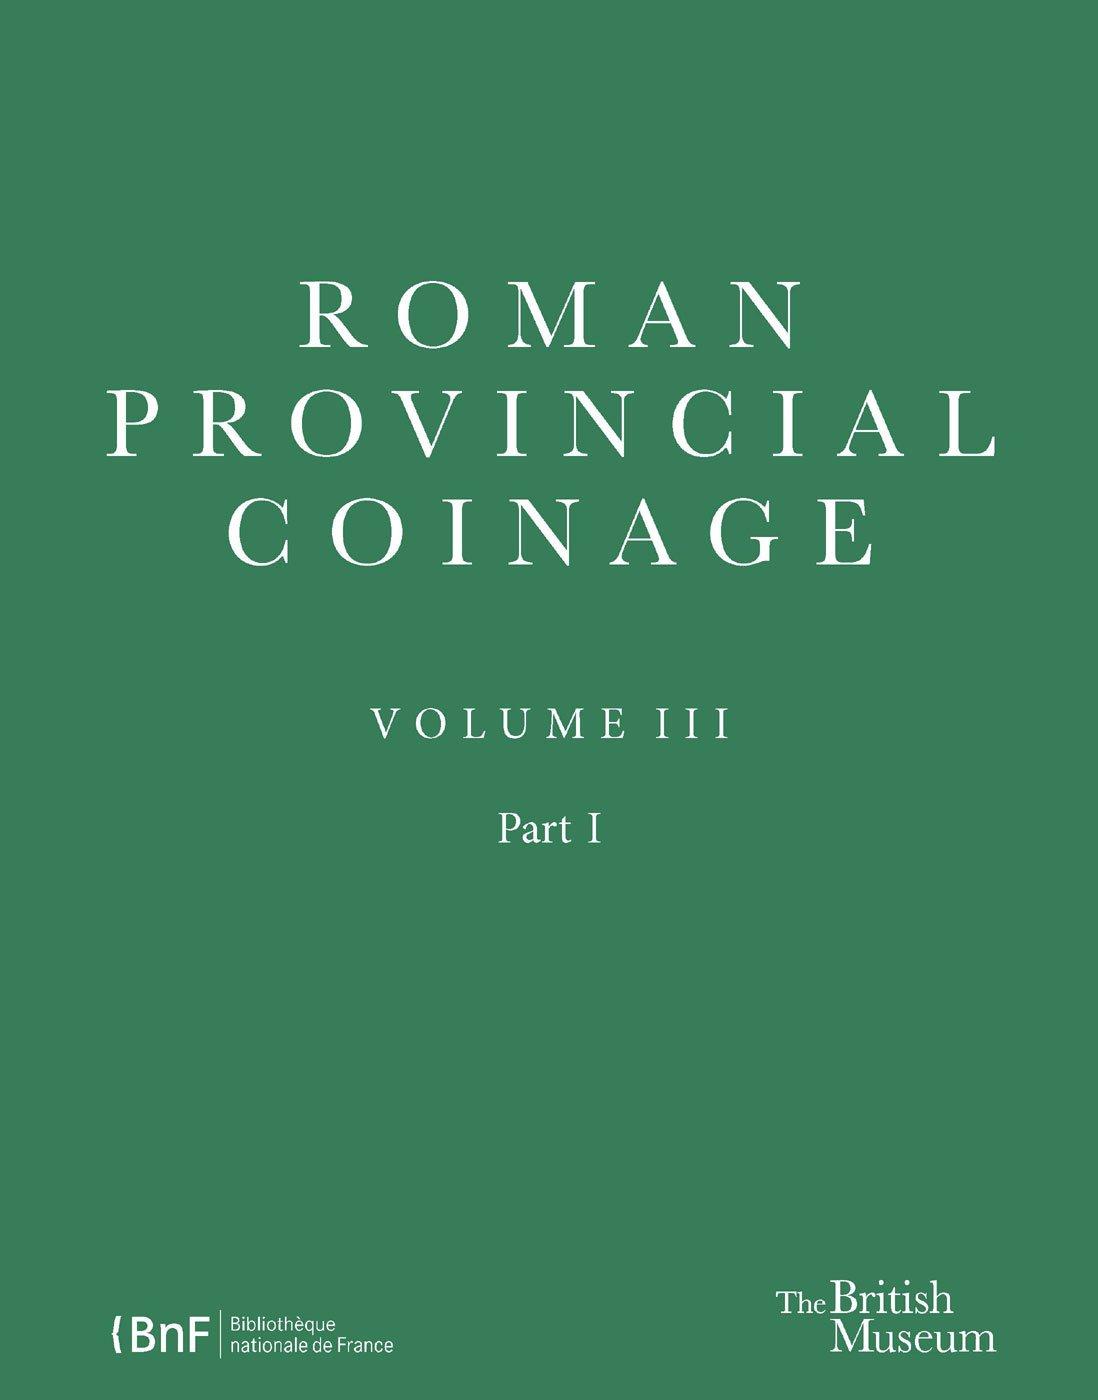 Roman Provincial Coinage III: Nerva, Trajan and Hadrian (AD 96-138)